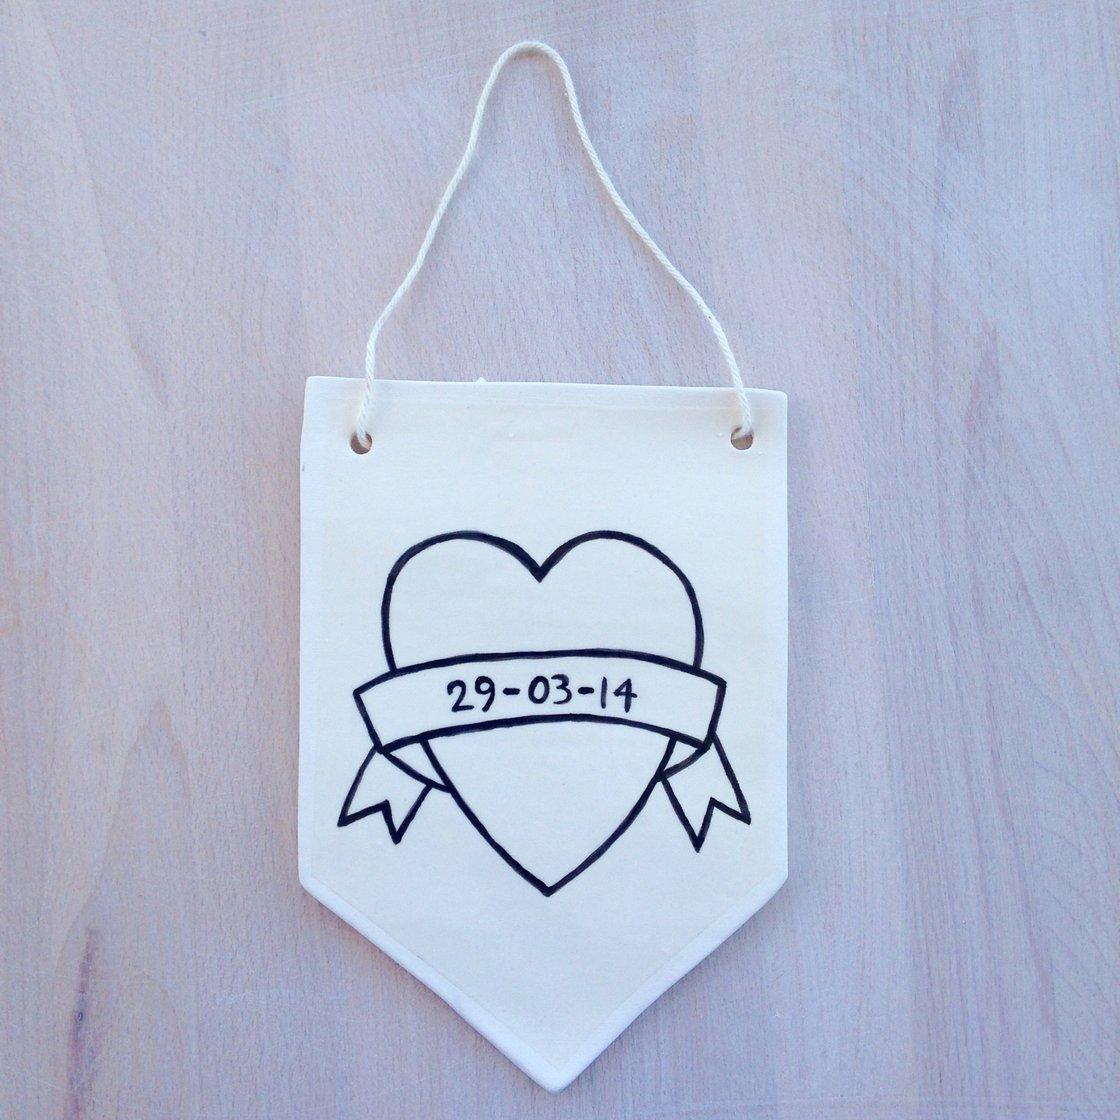 Image of Custom Heart Wall Hanging